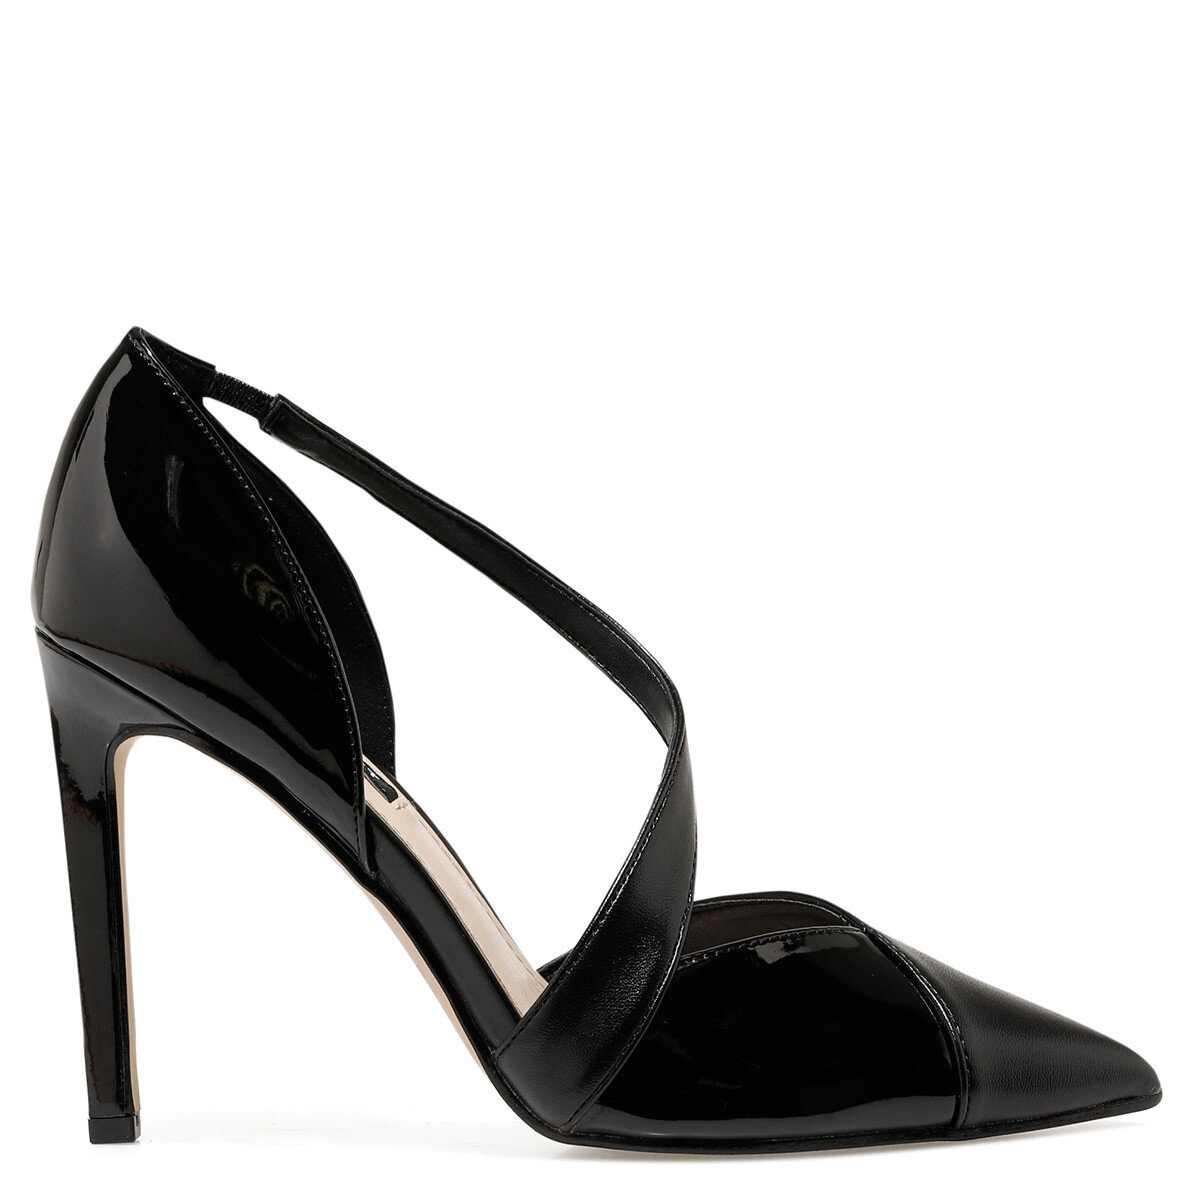 TINLEY3 Siyah Kadın Stiletto